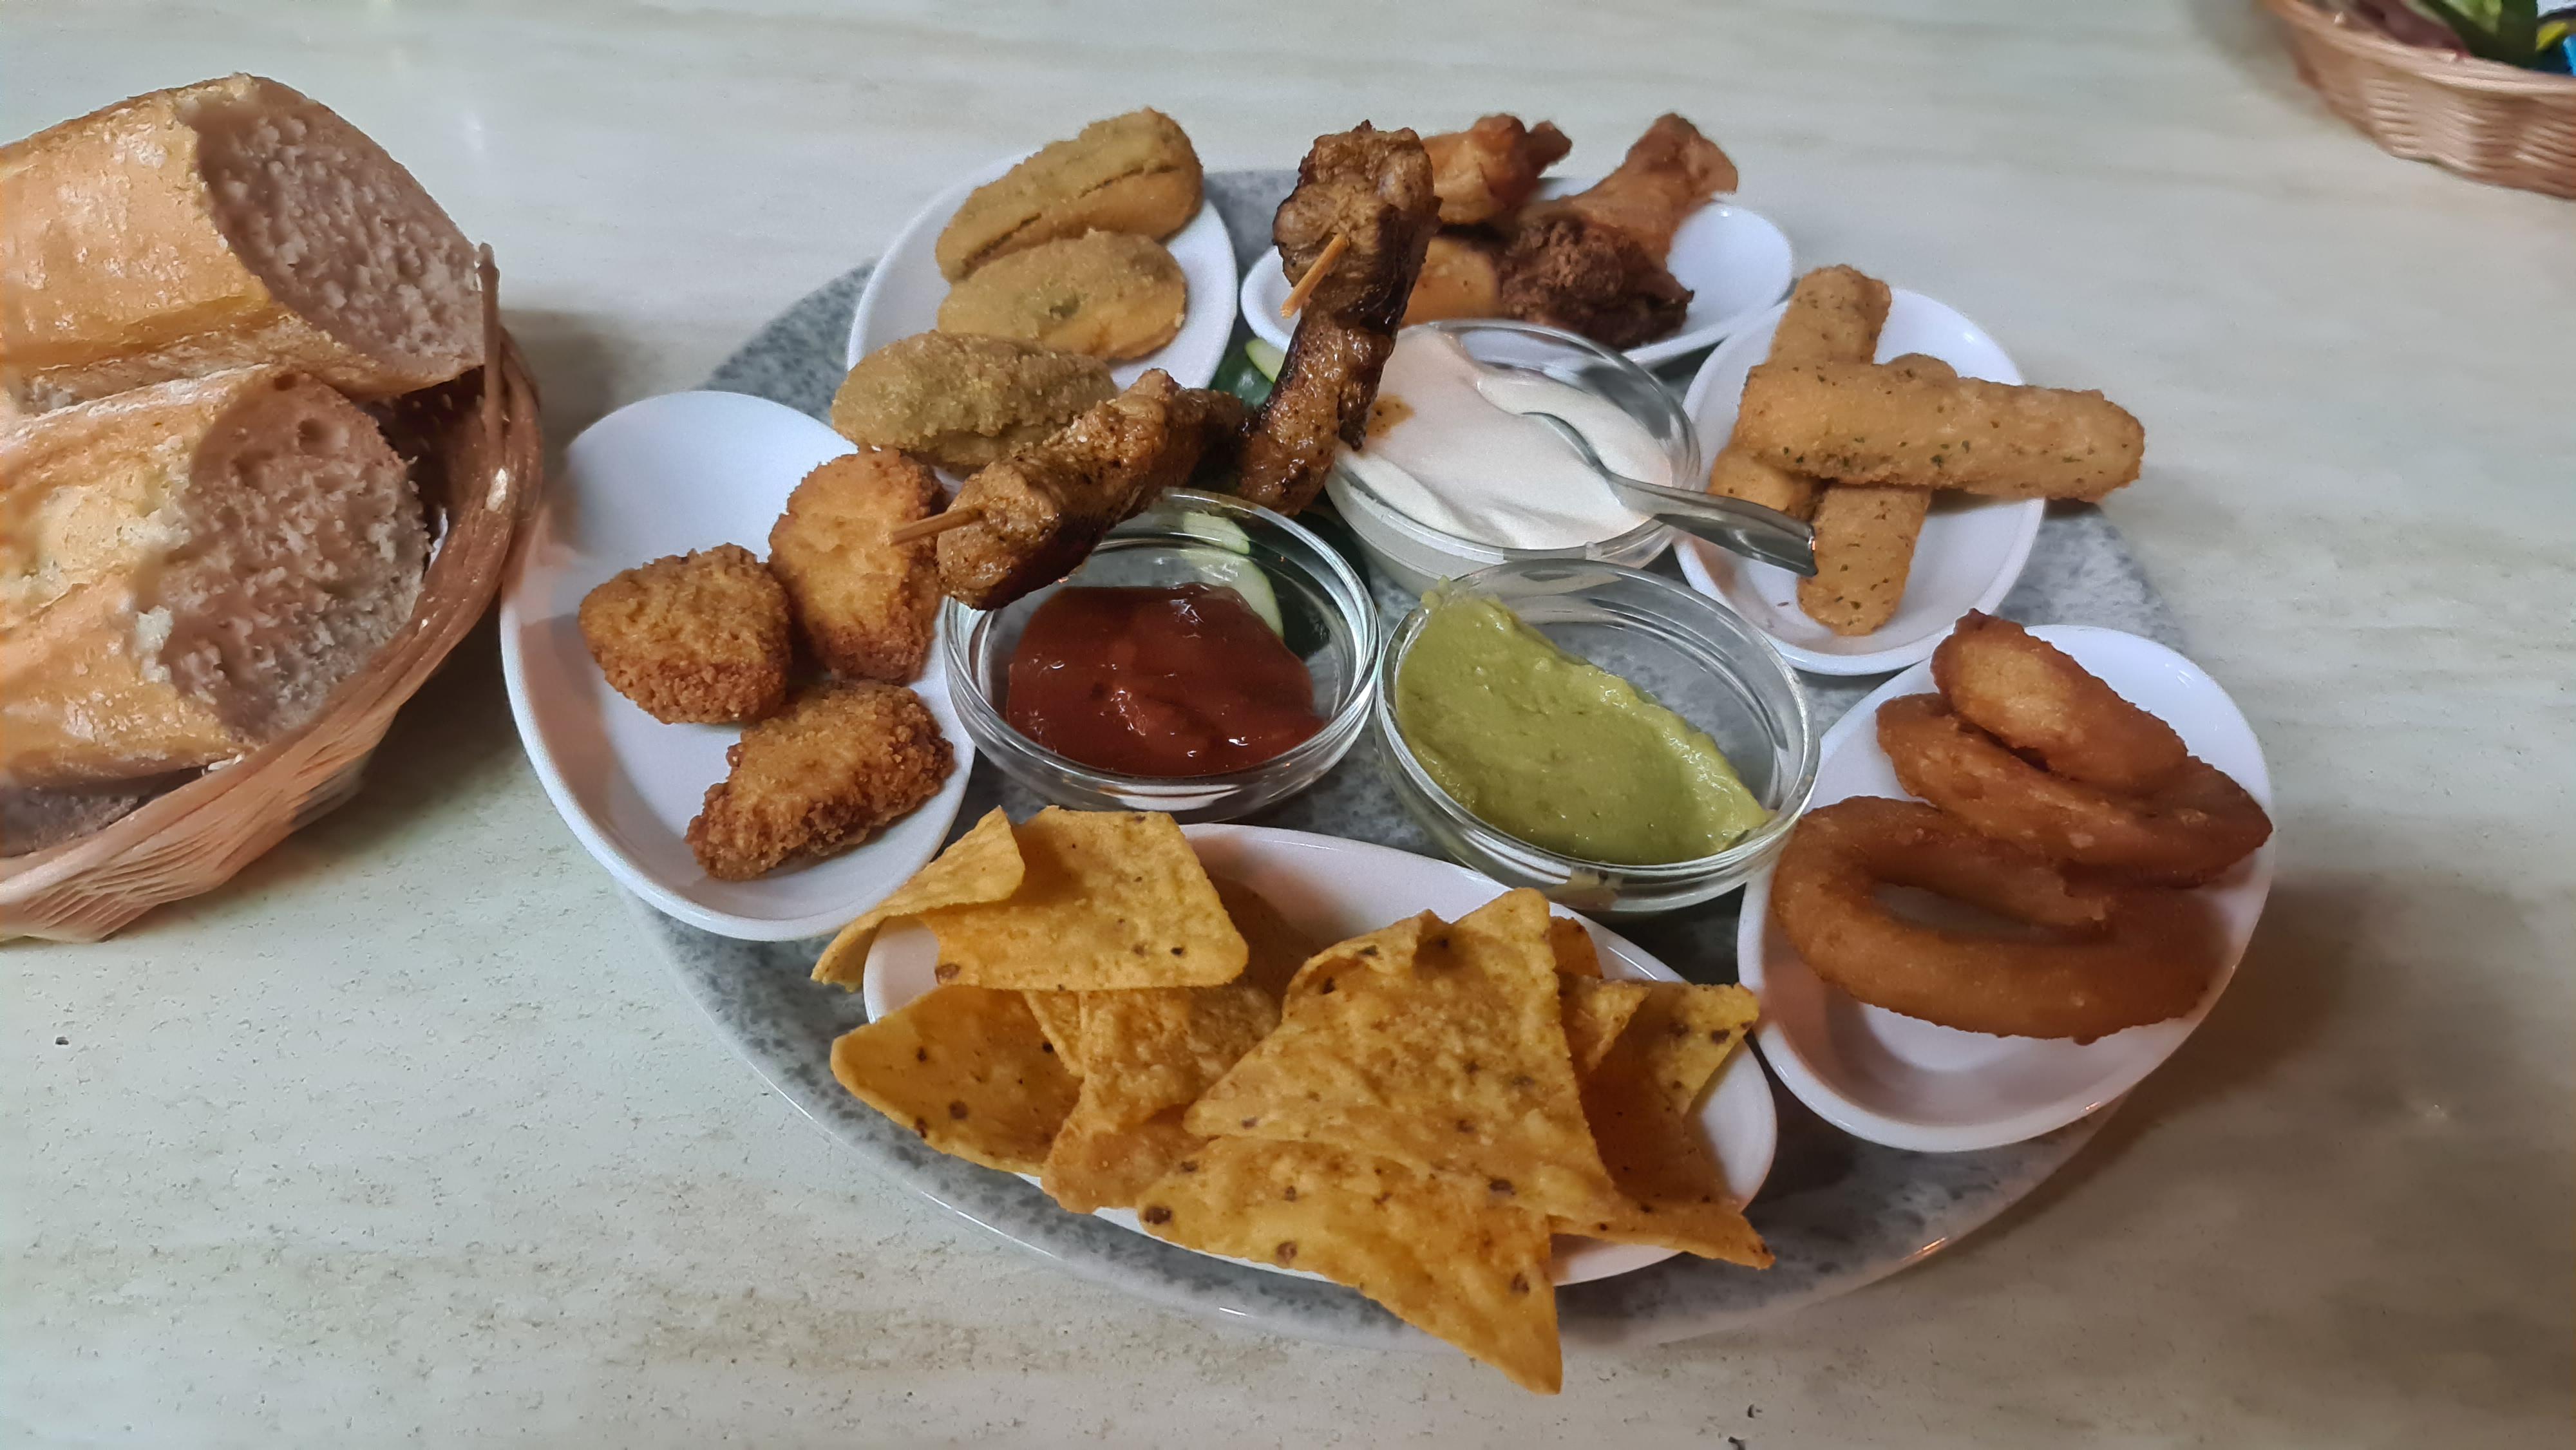 https://foodloader.net/Holz_2020-08-17_Mexikanische_Tapas.jpg